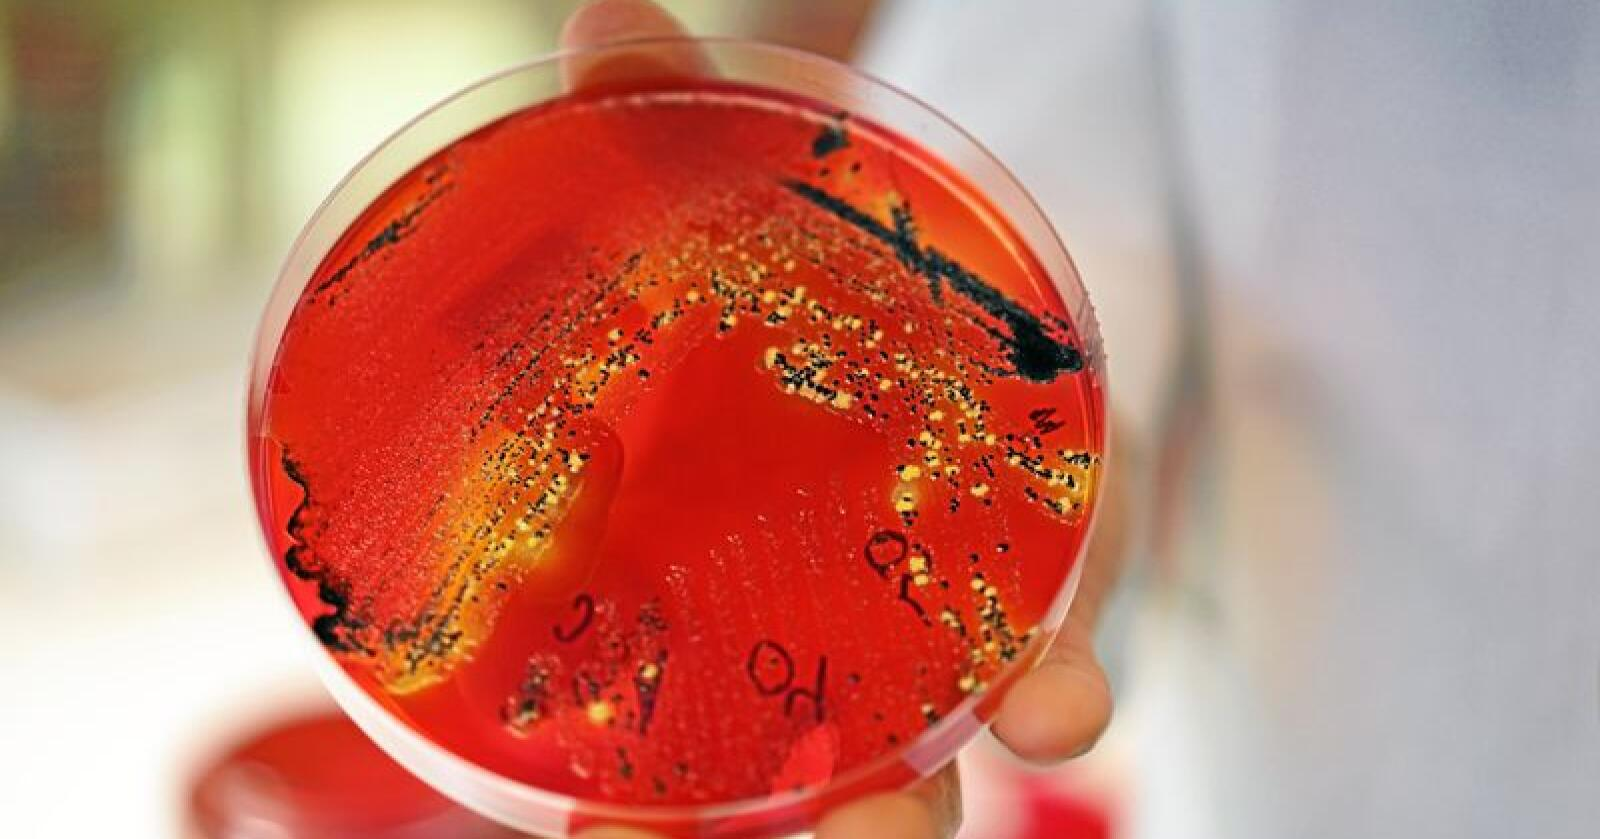 Det er påvist salmonella i en pose med tørket frukt fra Bama. Illustrasjonsfoto: Benjamin Hernes Vogl